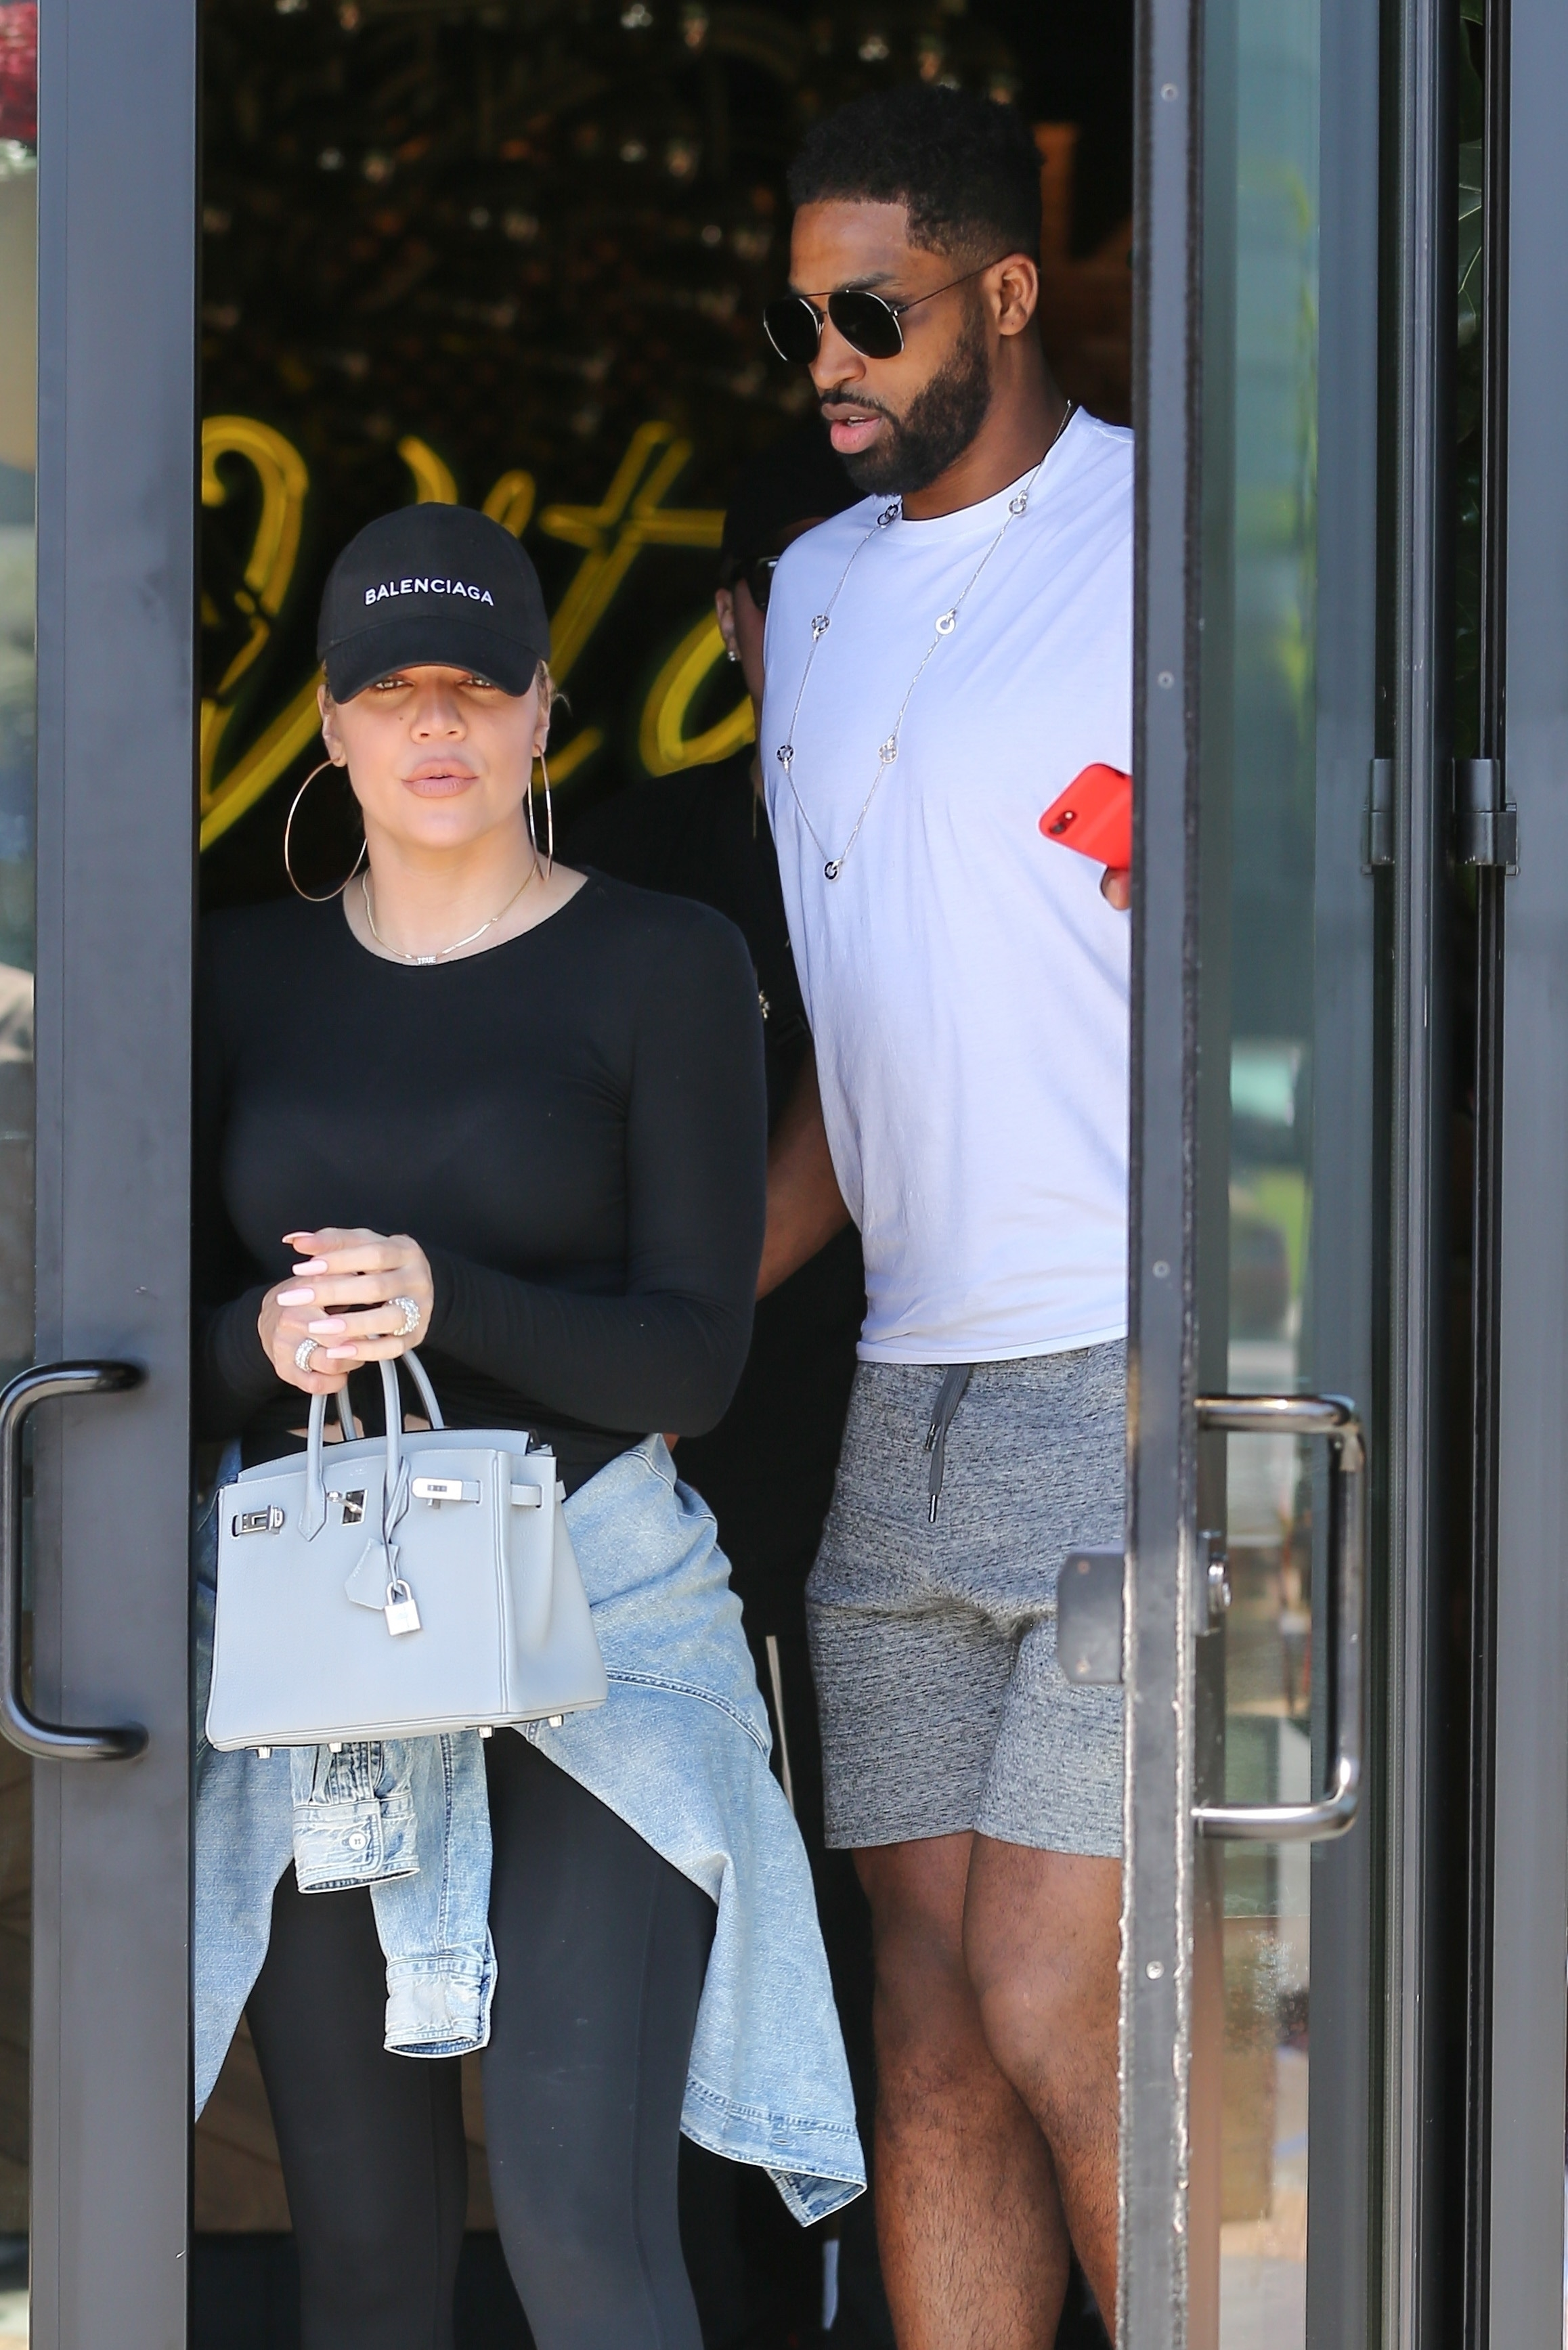 Khloe Kardashian and Tristan Thompson leave Joey restaurant in Woodland Hills, California, on June 20, 2018.